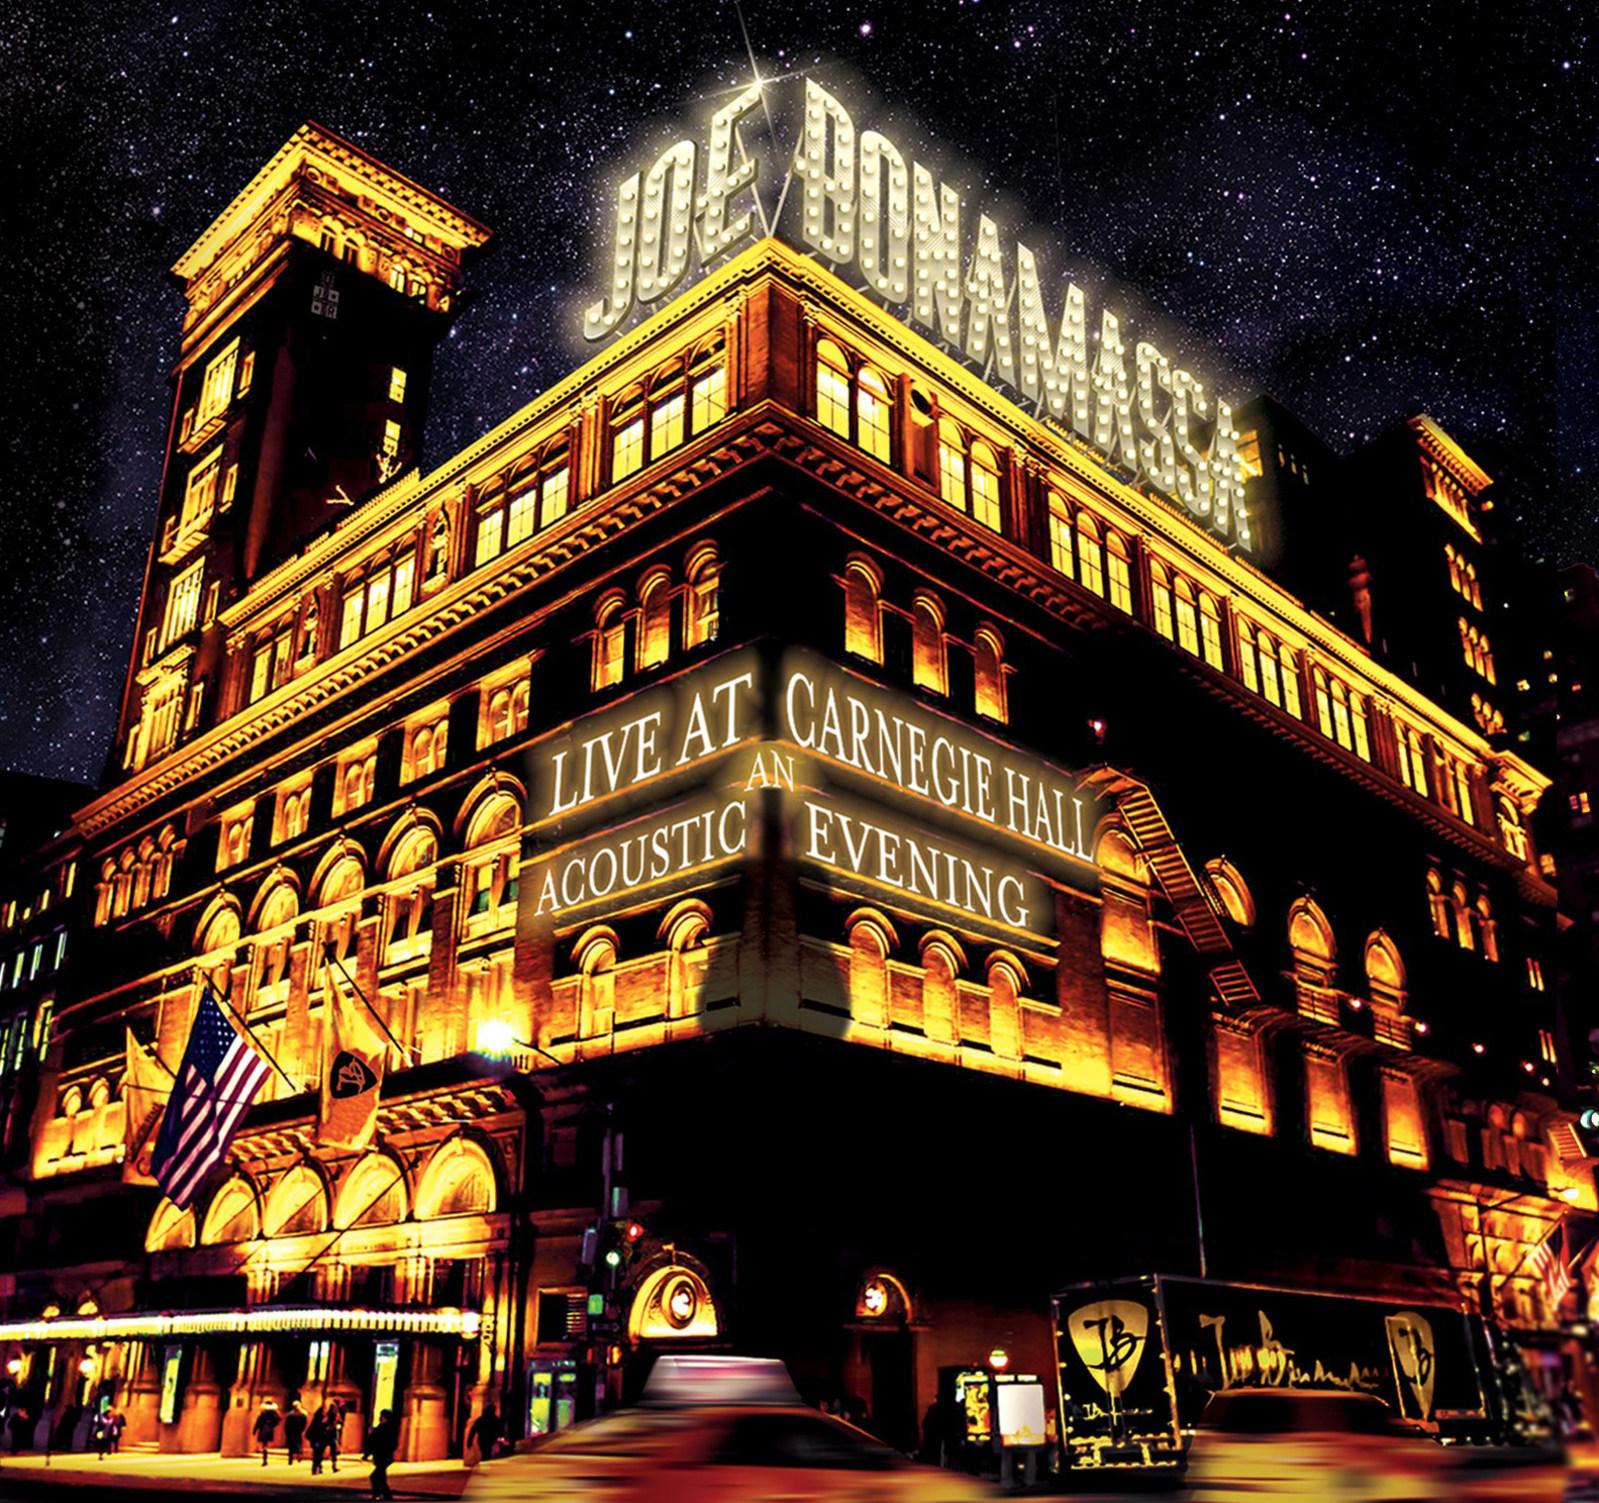 Live At Carnegie Hall image